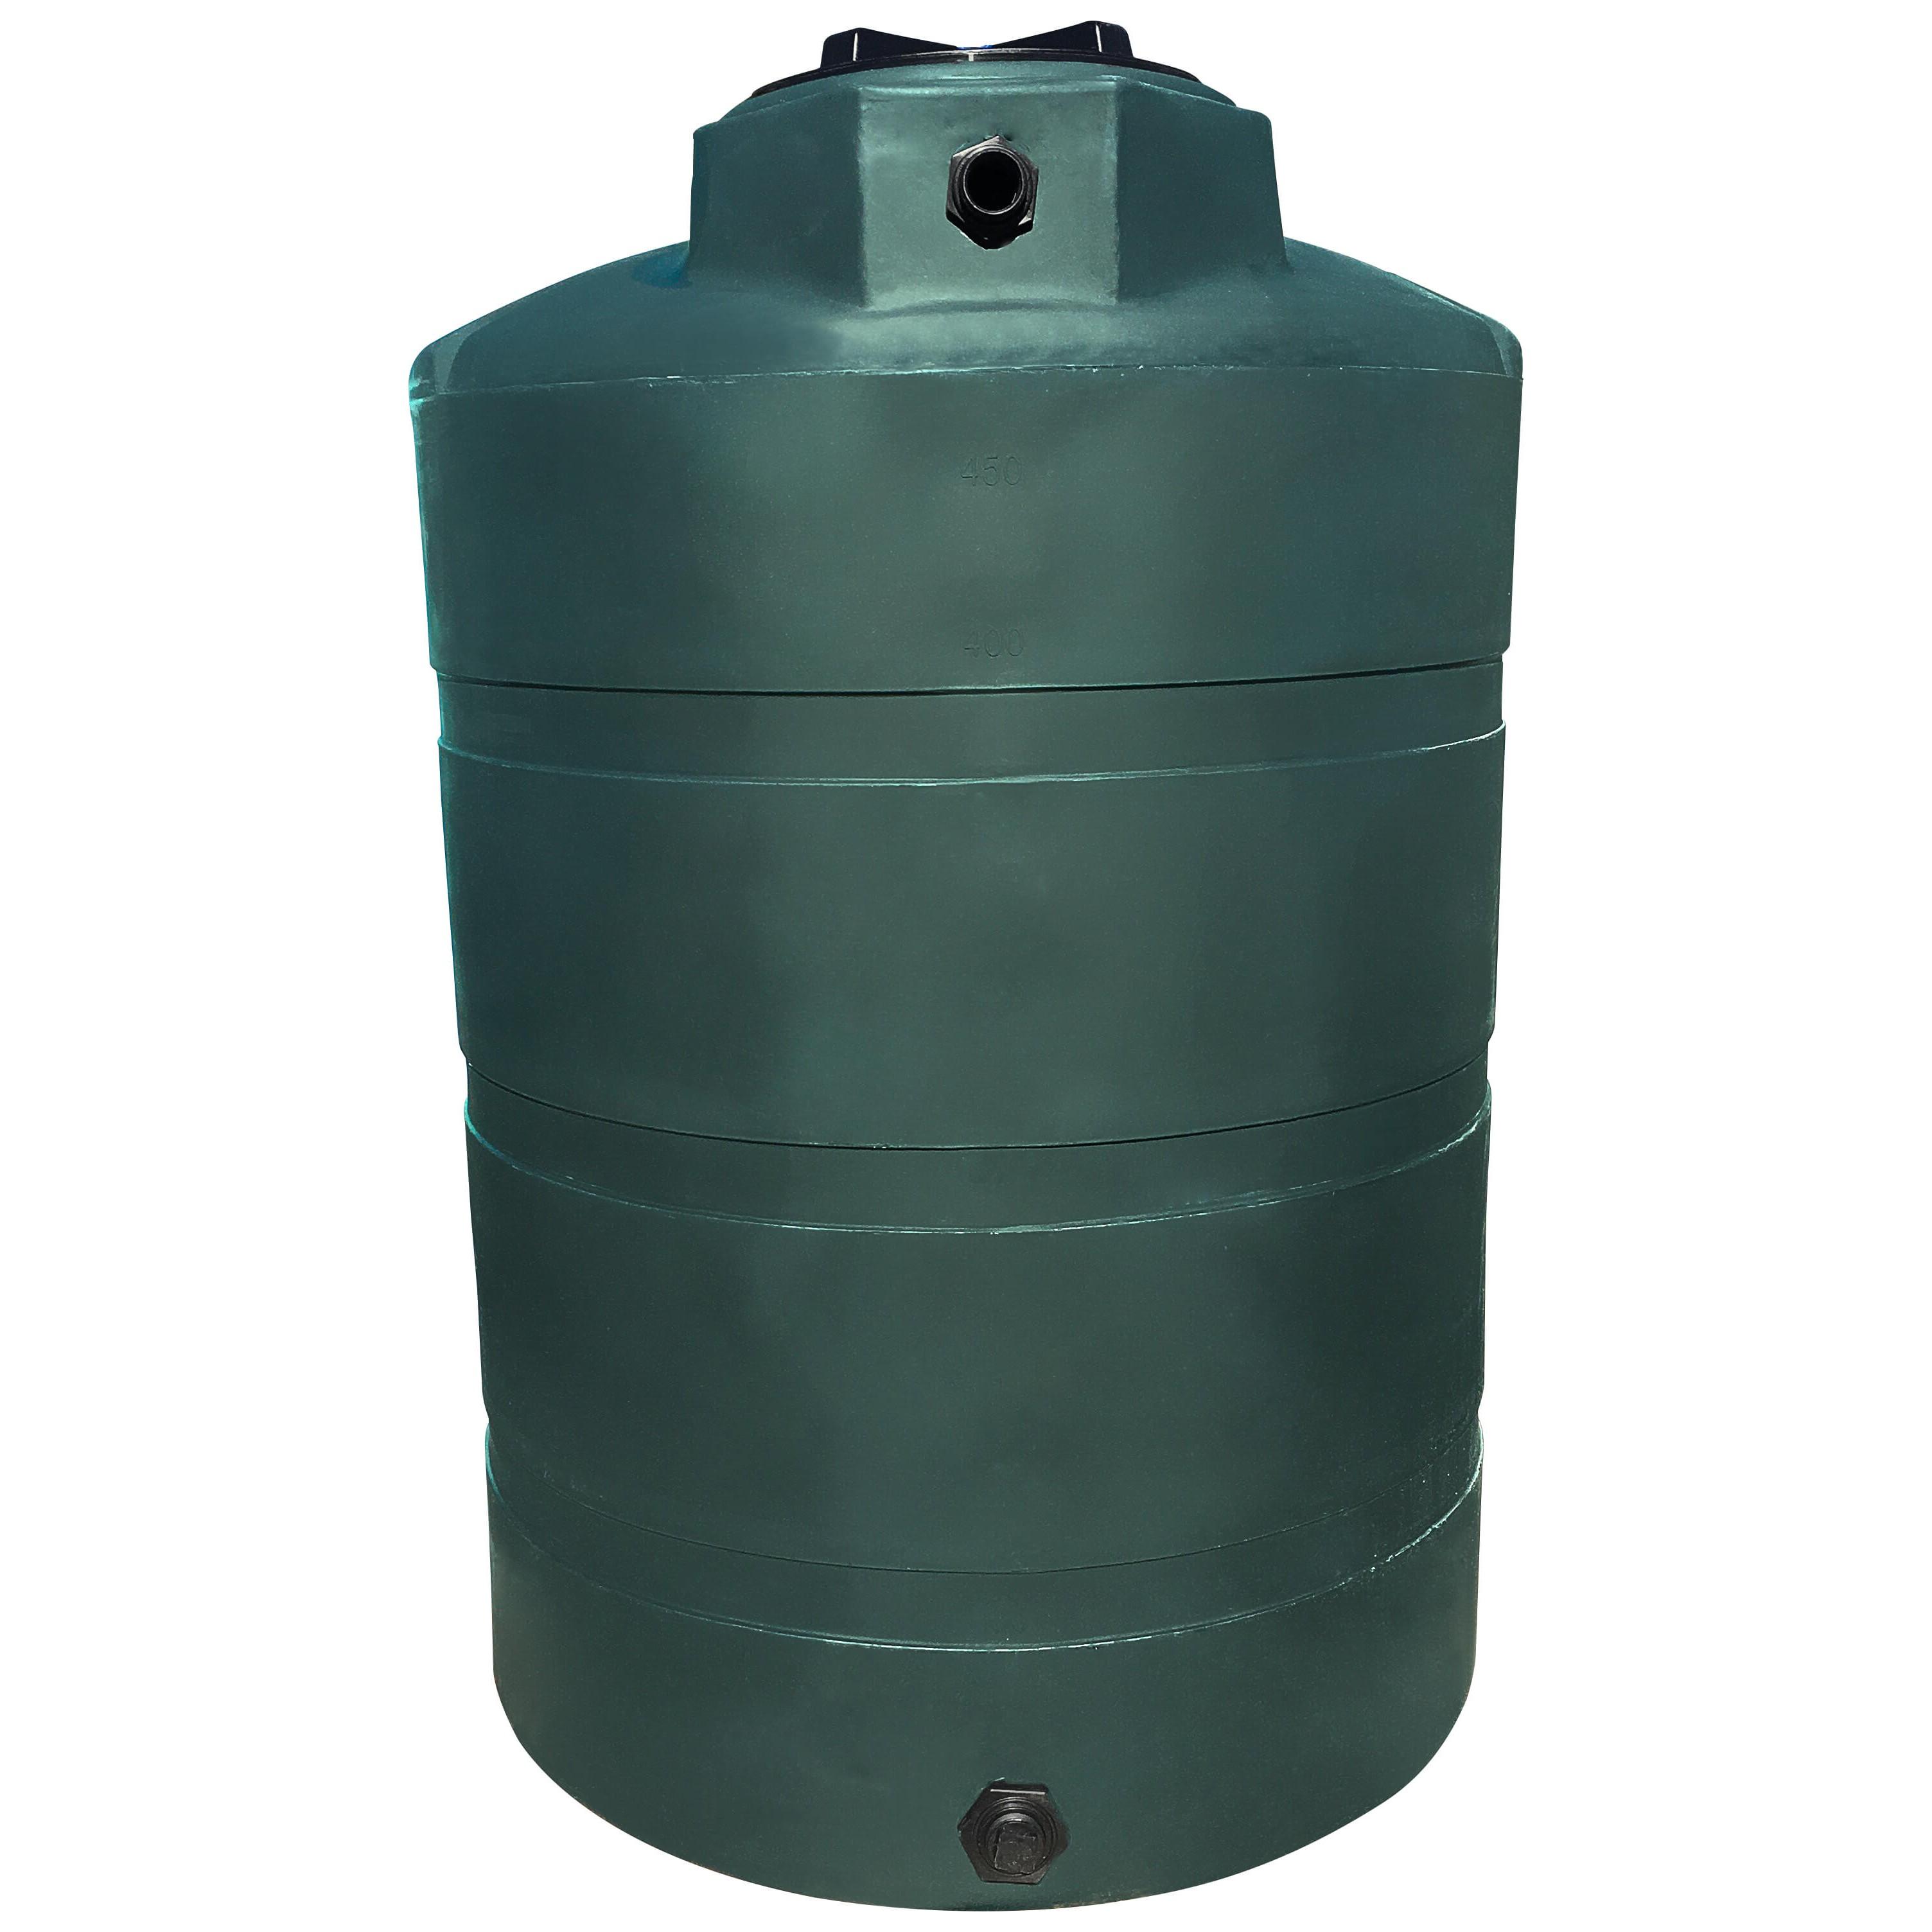 500 Gallon Water Tank >> 500 Gallon Water Storage Tank Green Norwesco 43105